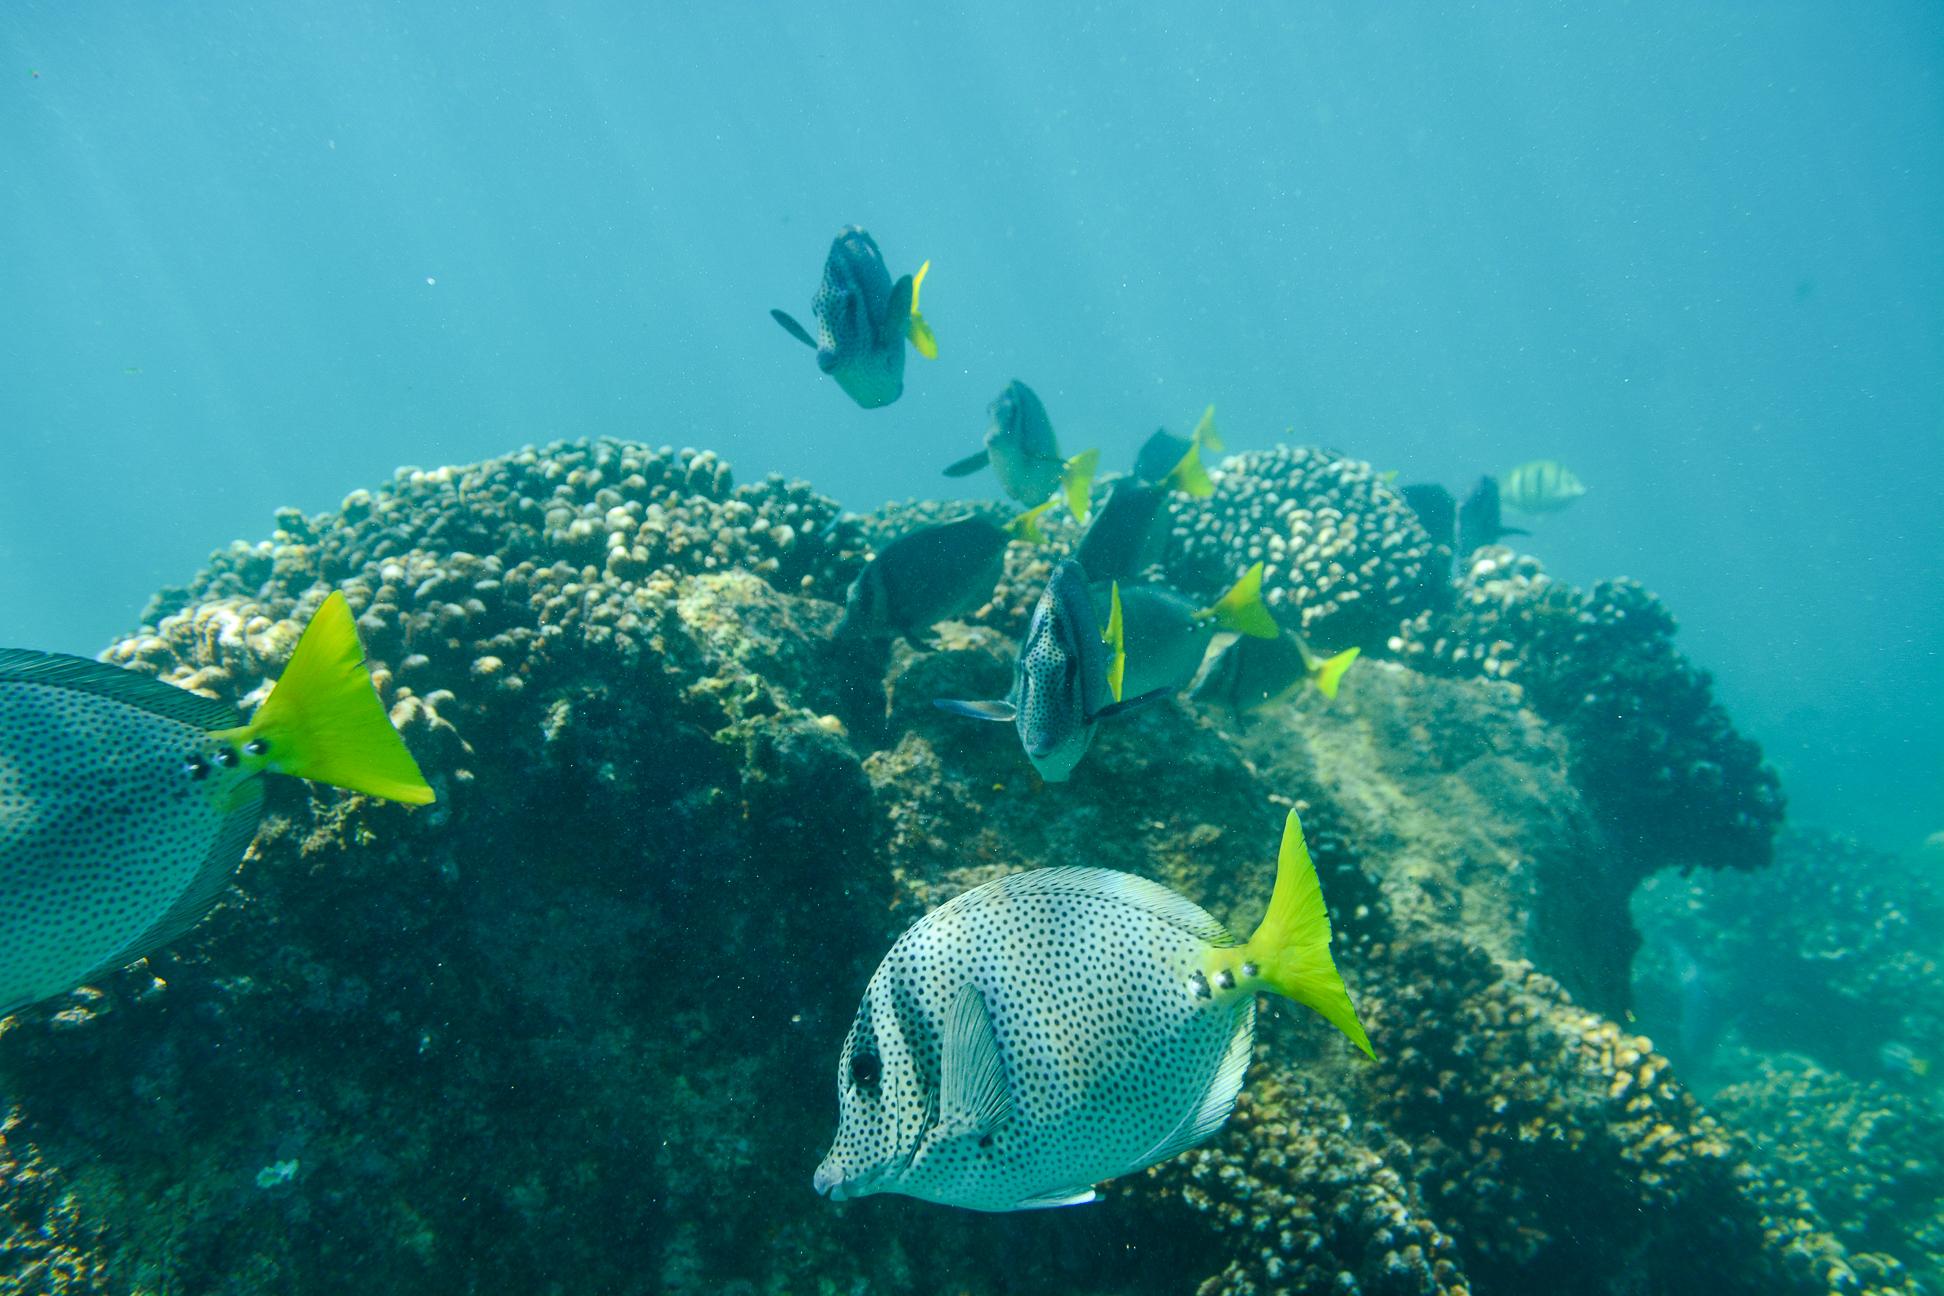 Chileno Bay and Santa Maria snorkeling experience in Mexico